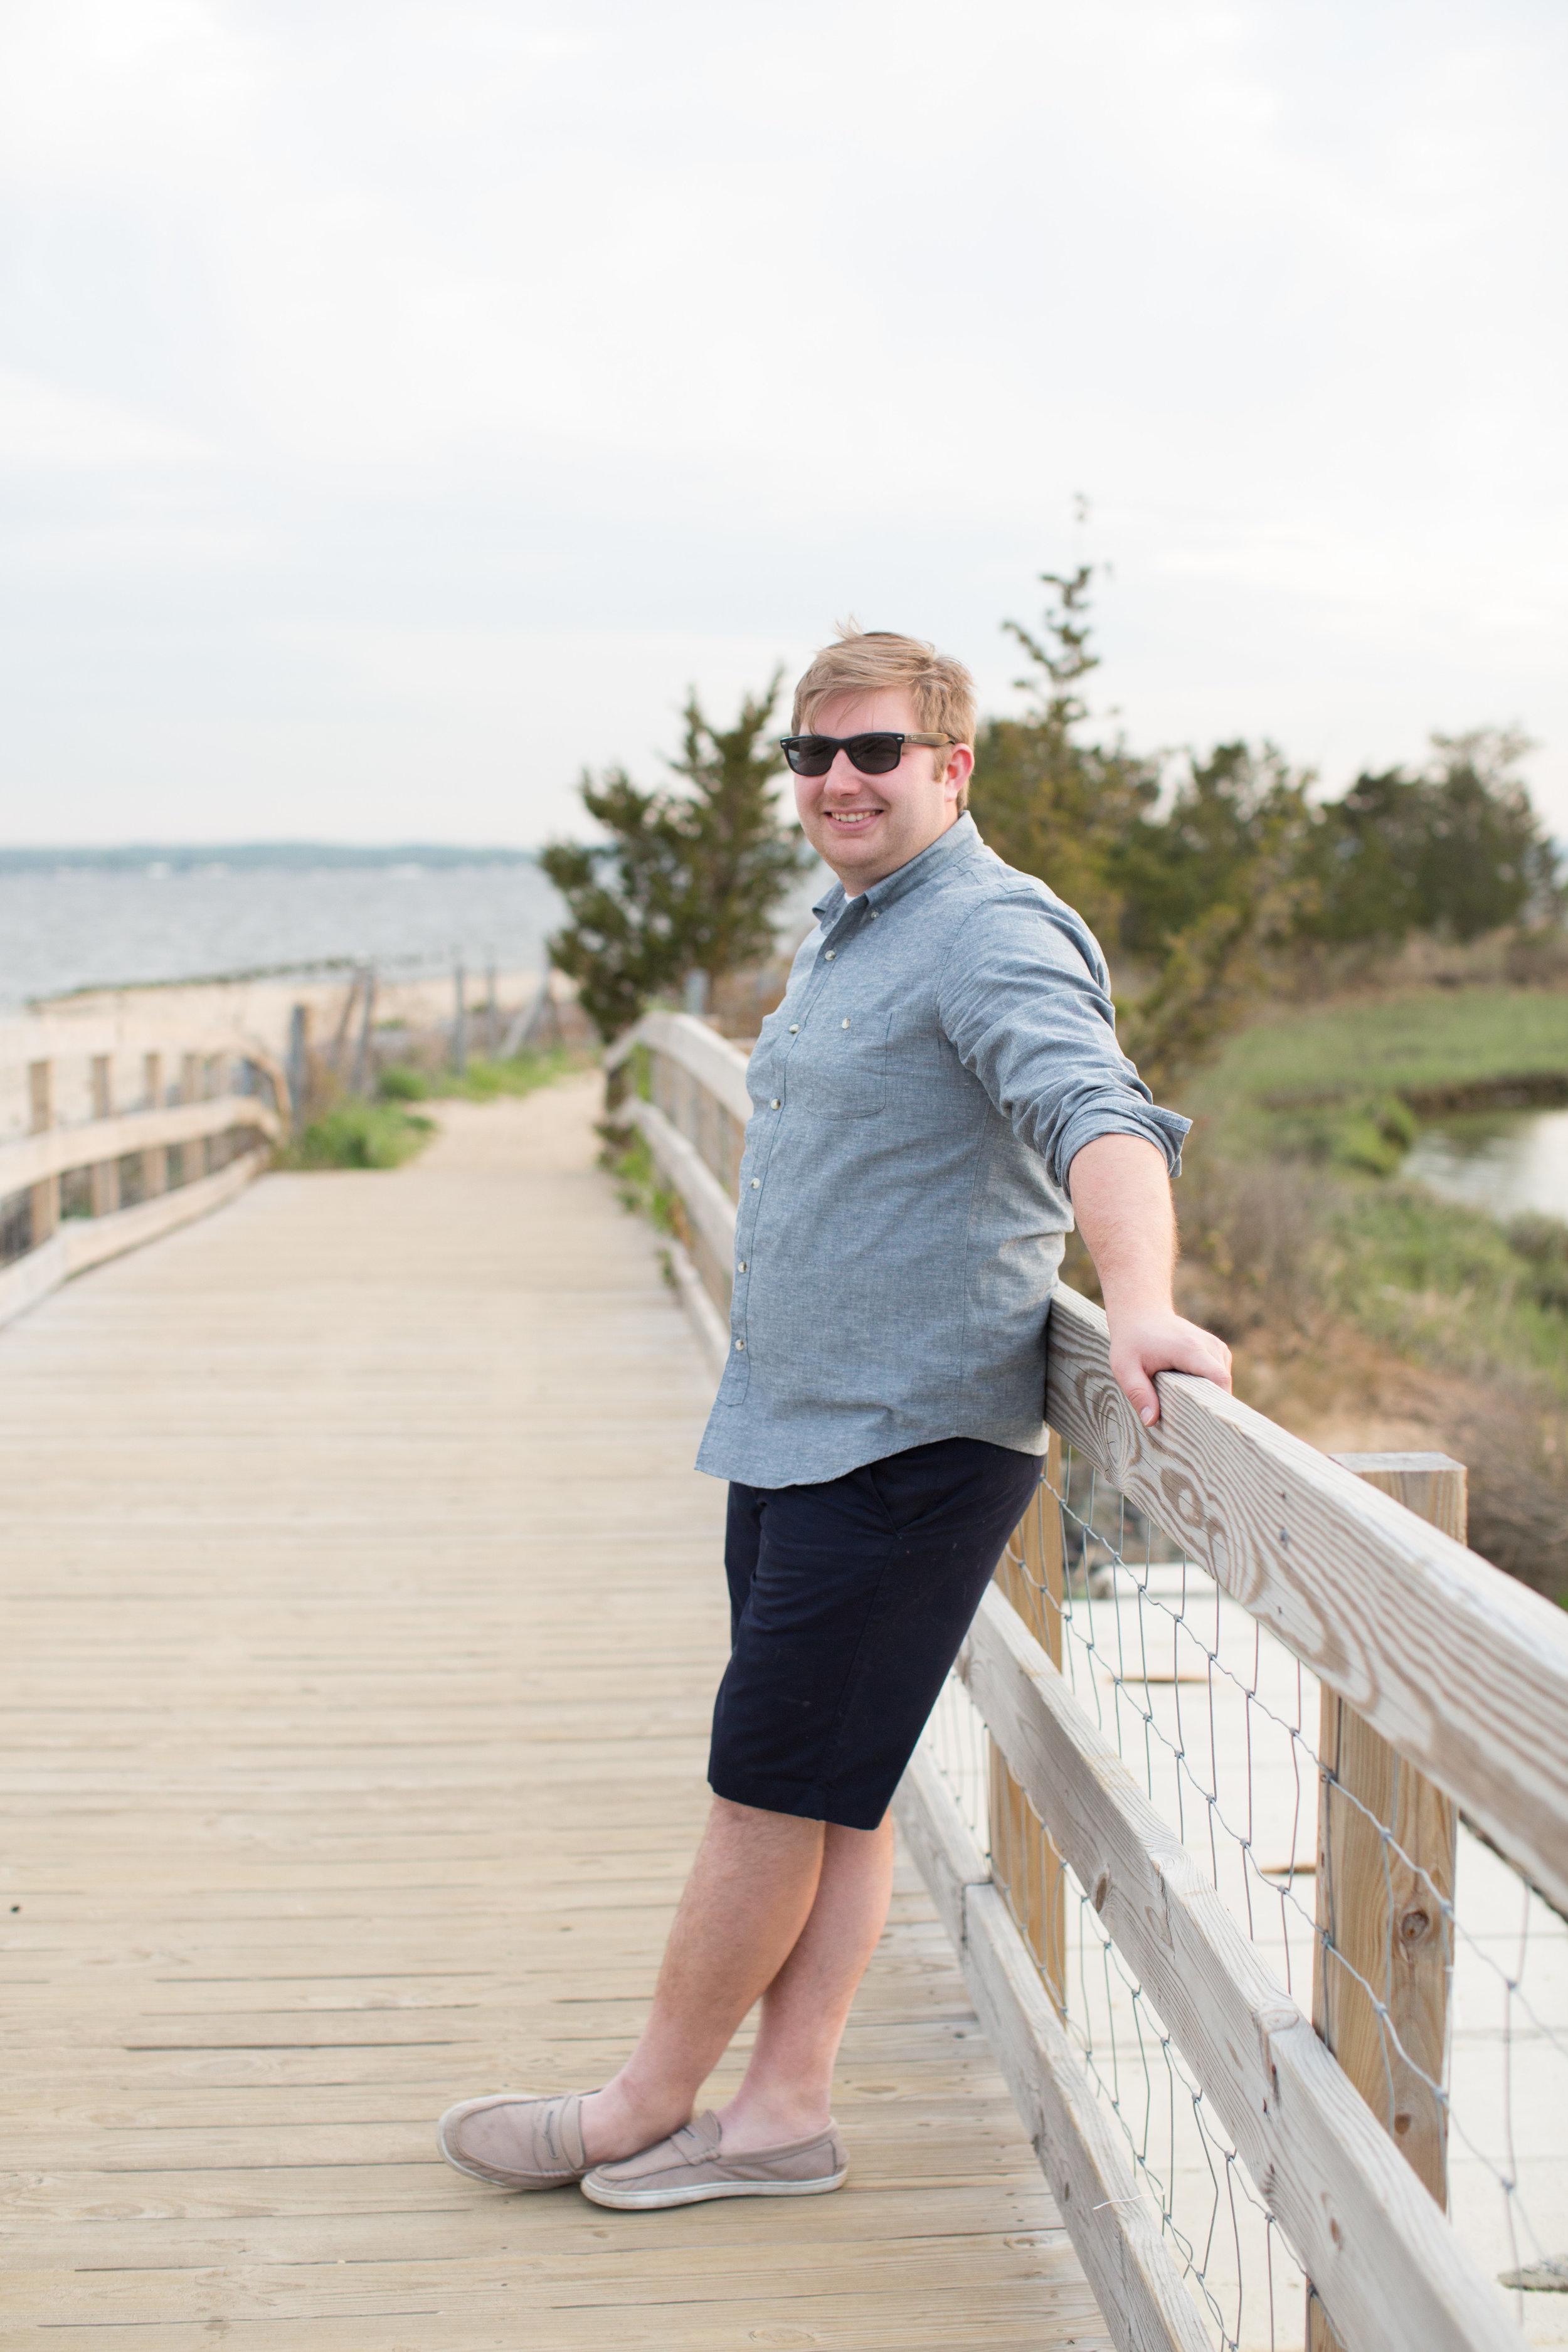 beach engagement photo shoot with jaye kogut photography on boardwalk